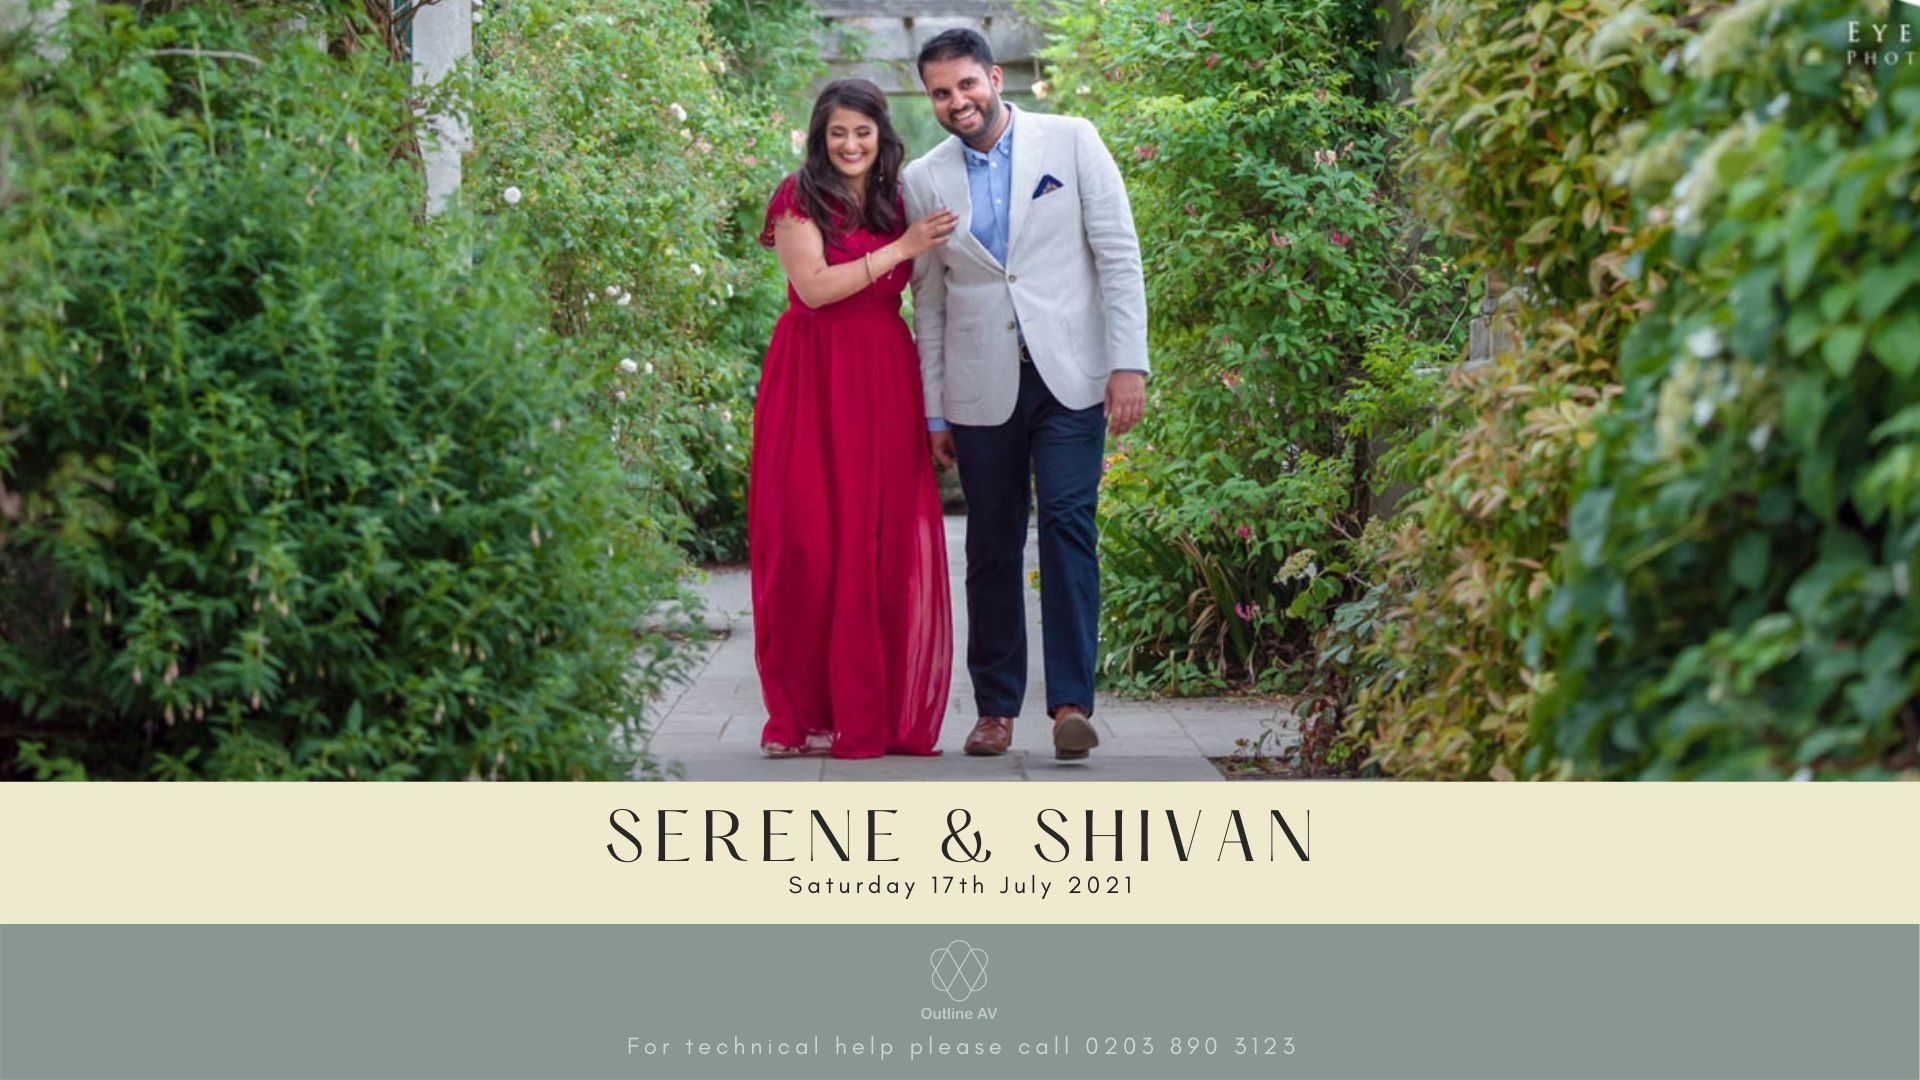 Serene & Shivan - 17.07.2021 - Live Stream (1)